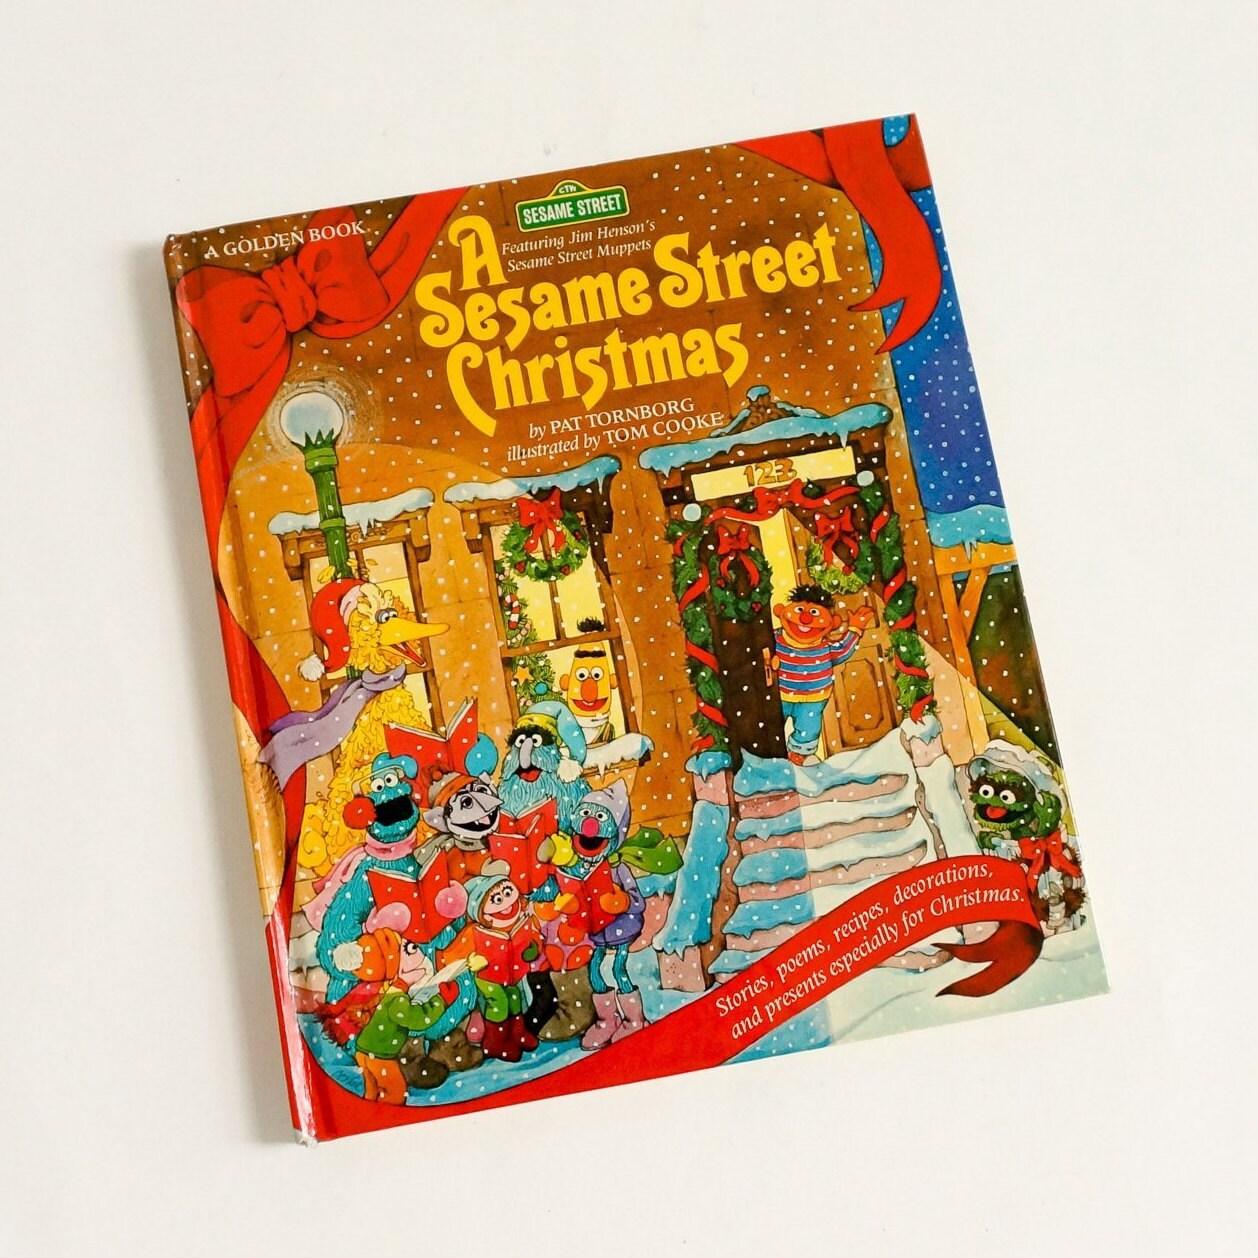 A Sesame Street Christmas by Pat Tornborg 1982 Hc Stories | Etsy